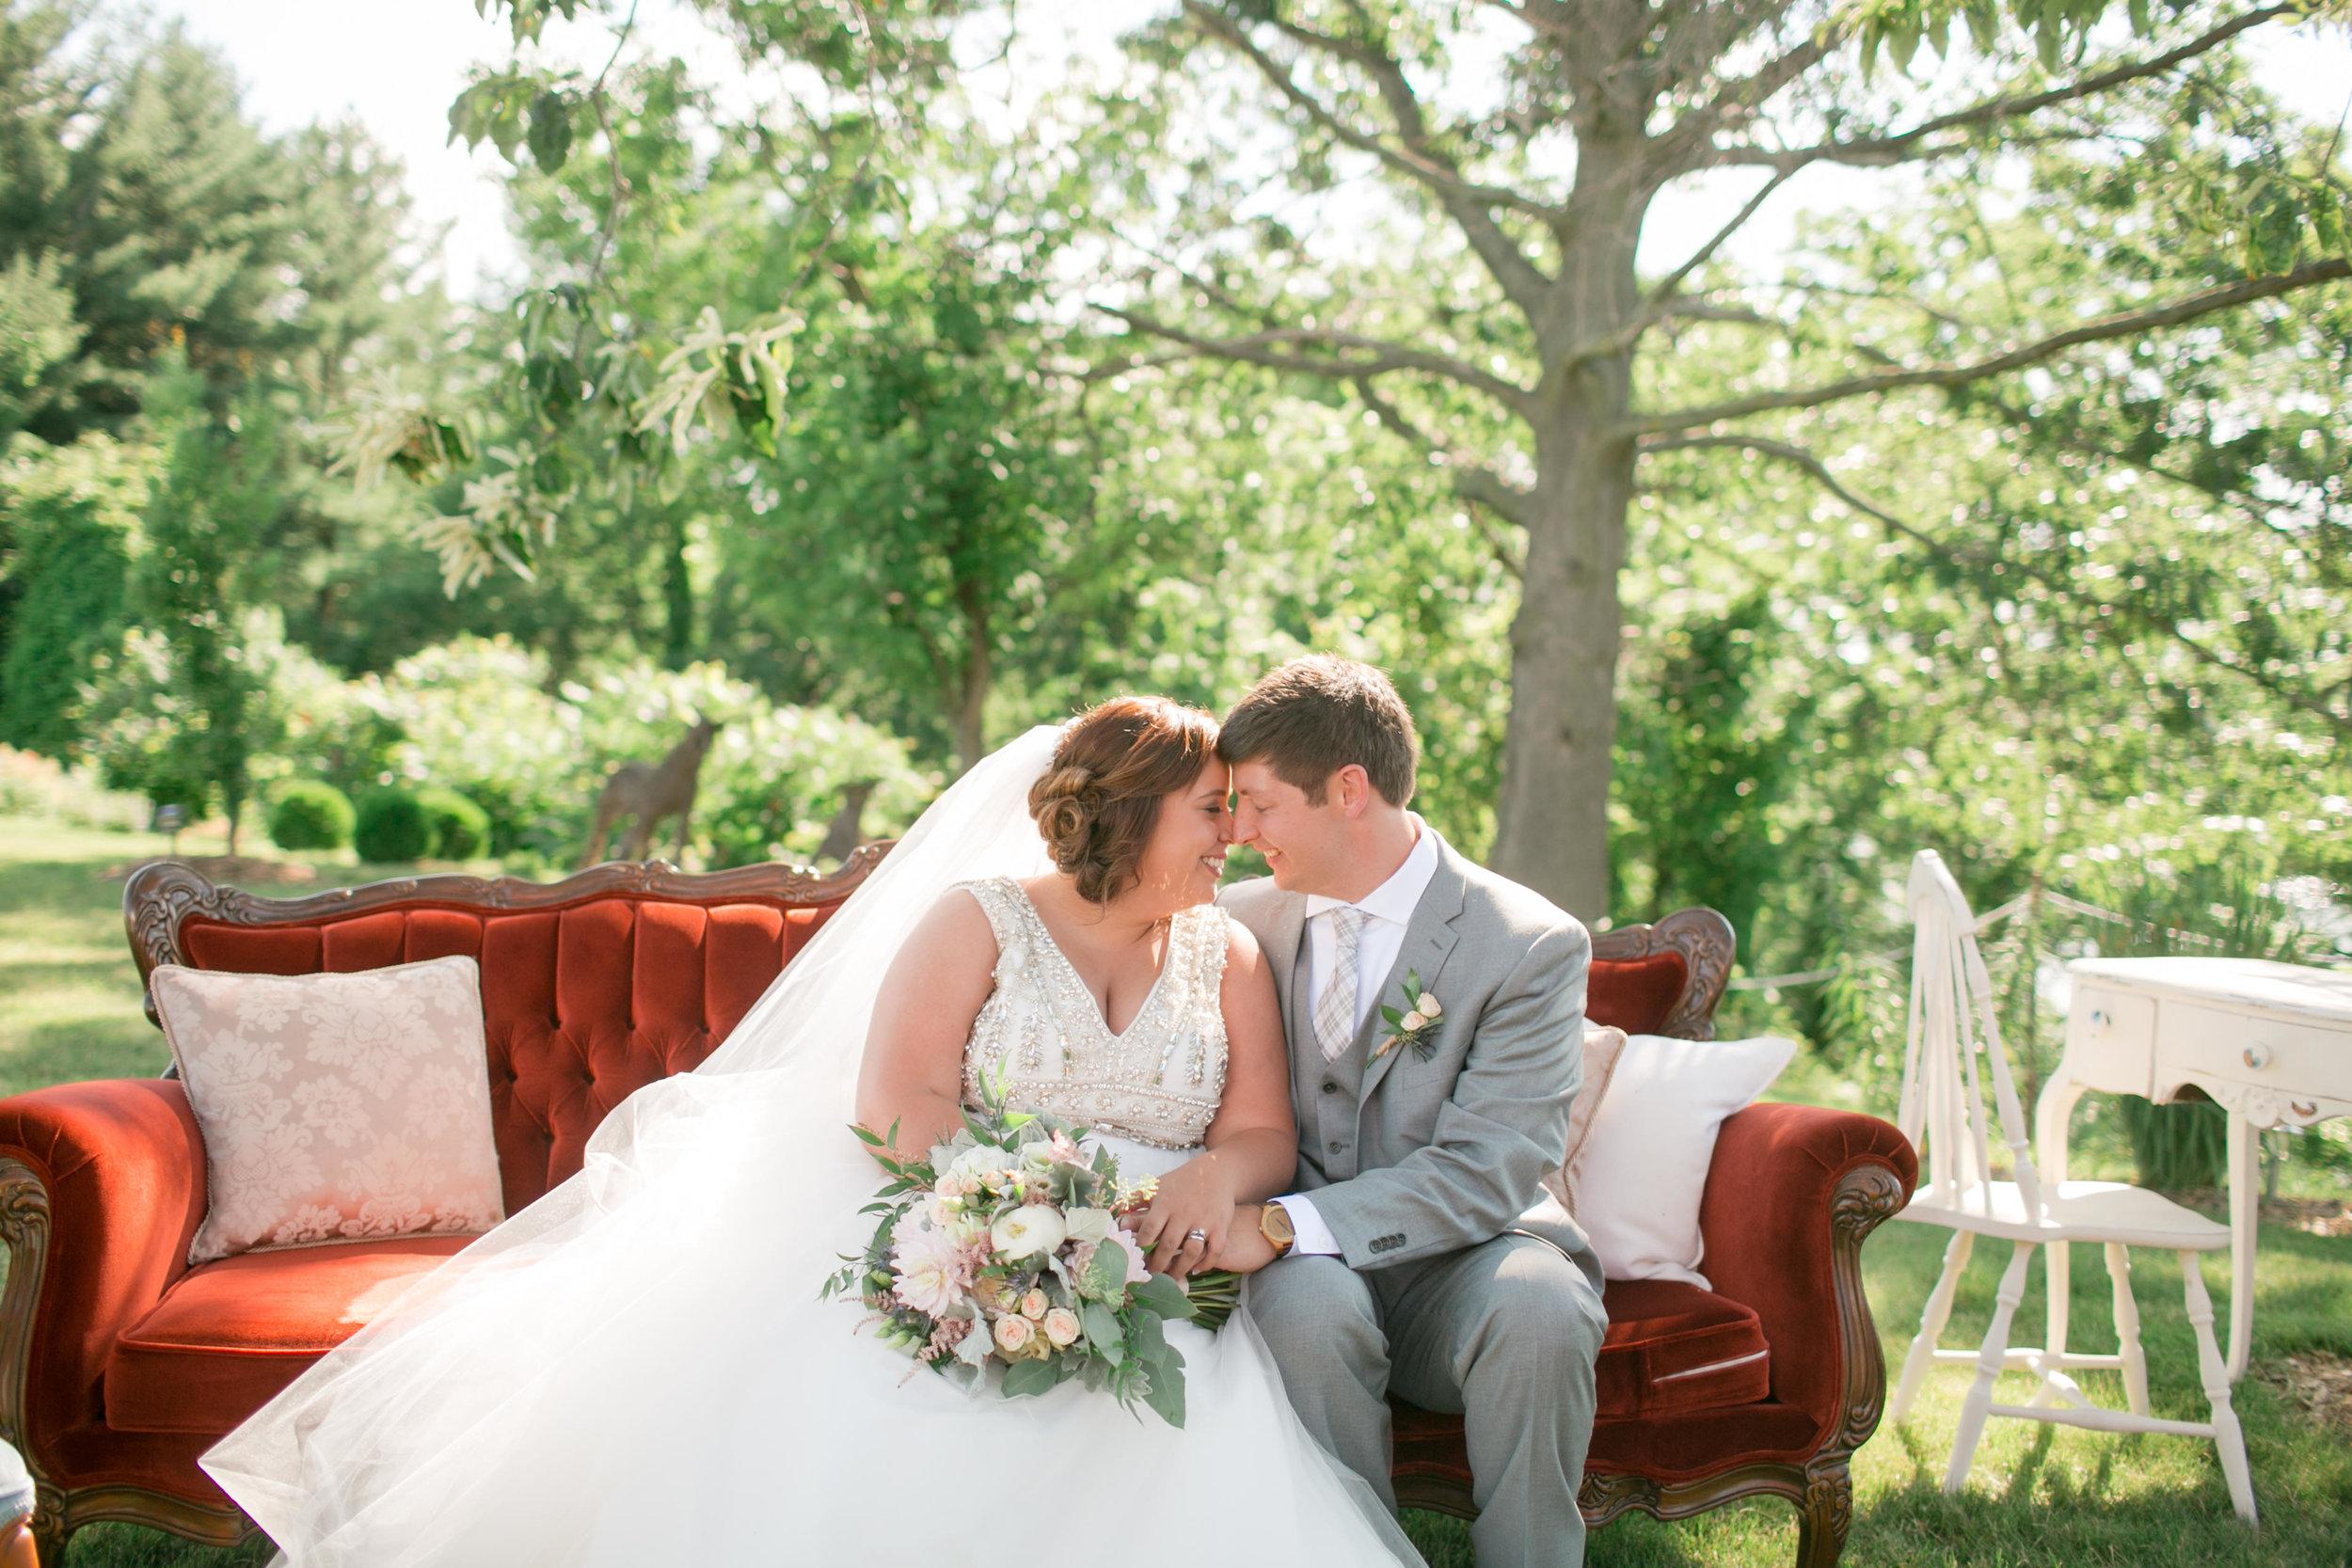 Kimberley + Cameron - Daniel Ricci Weddings - High Res. Finals-333.jpg